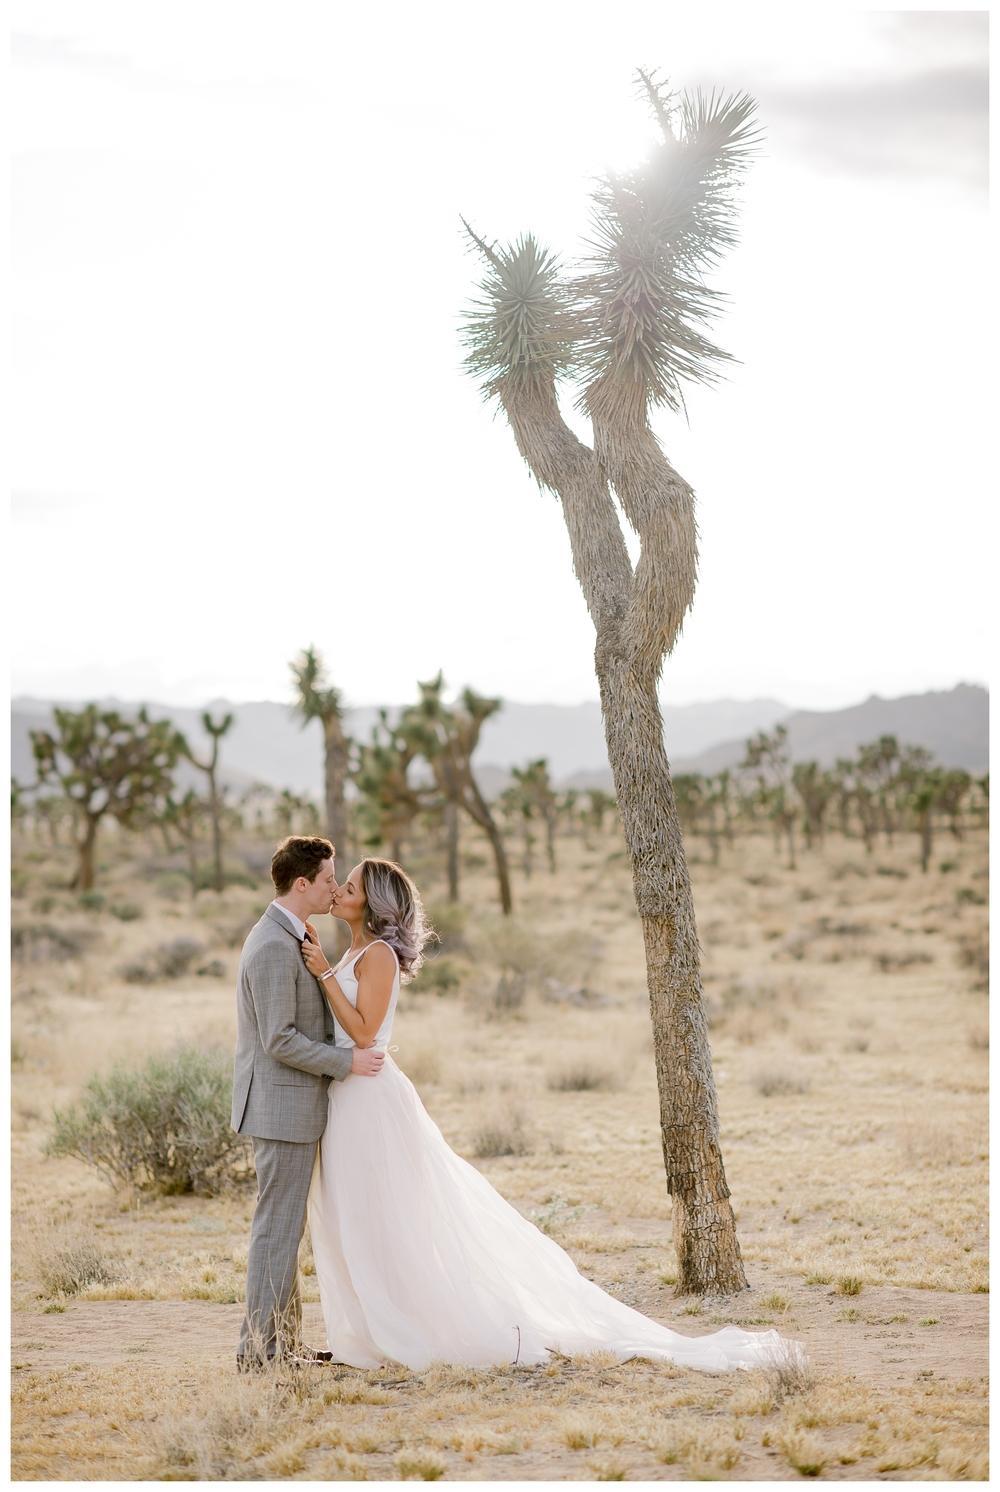 Rebecca_Bridges_Photography_Indianapolis_Wedding_Photographer_4111.jpg